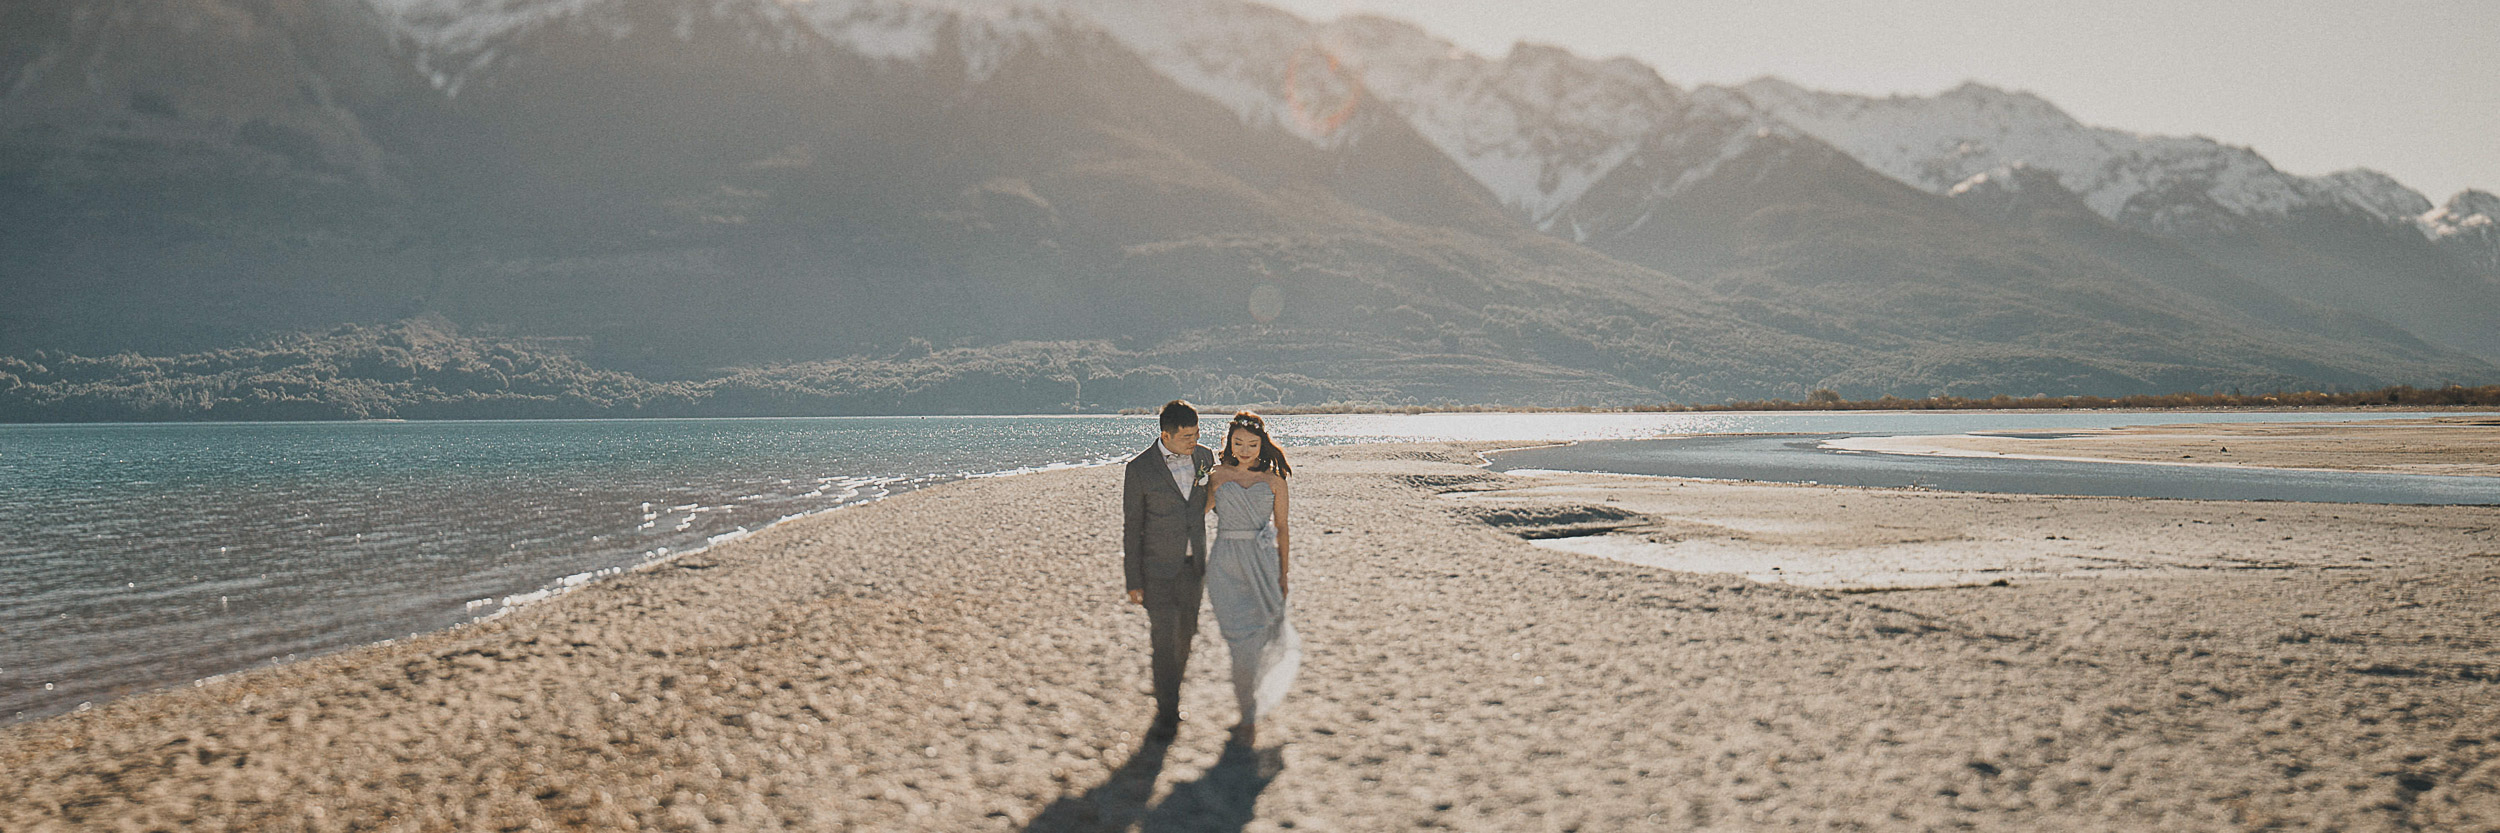 PRE-WEDDING+ ELOPEMENT PRICING -